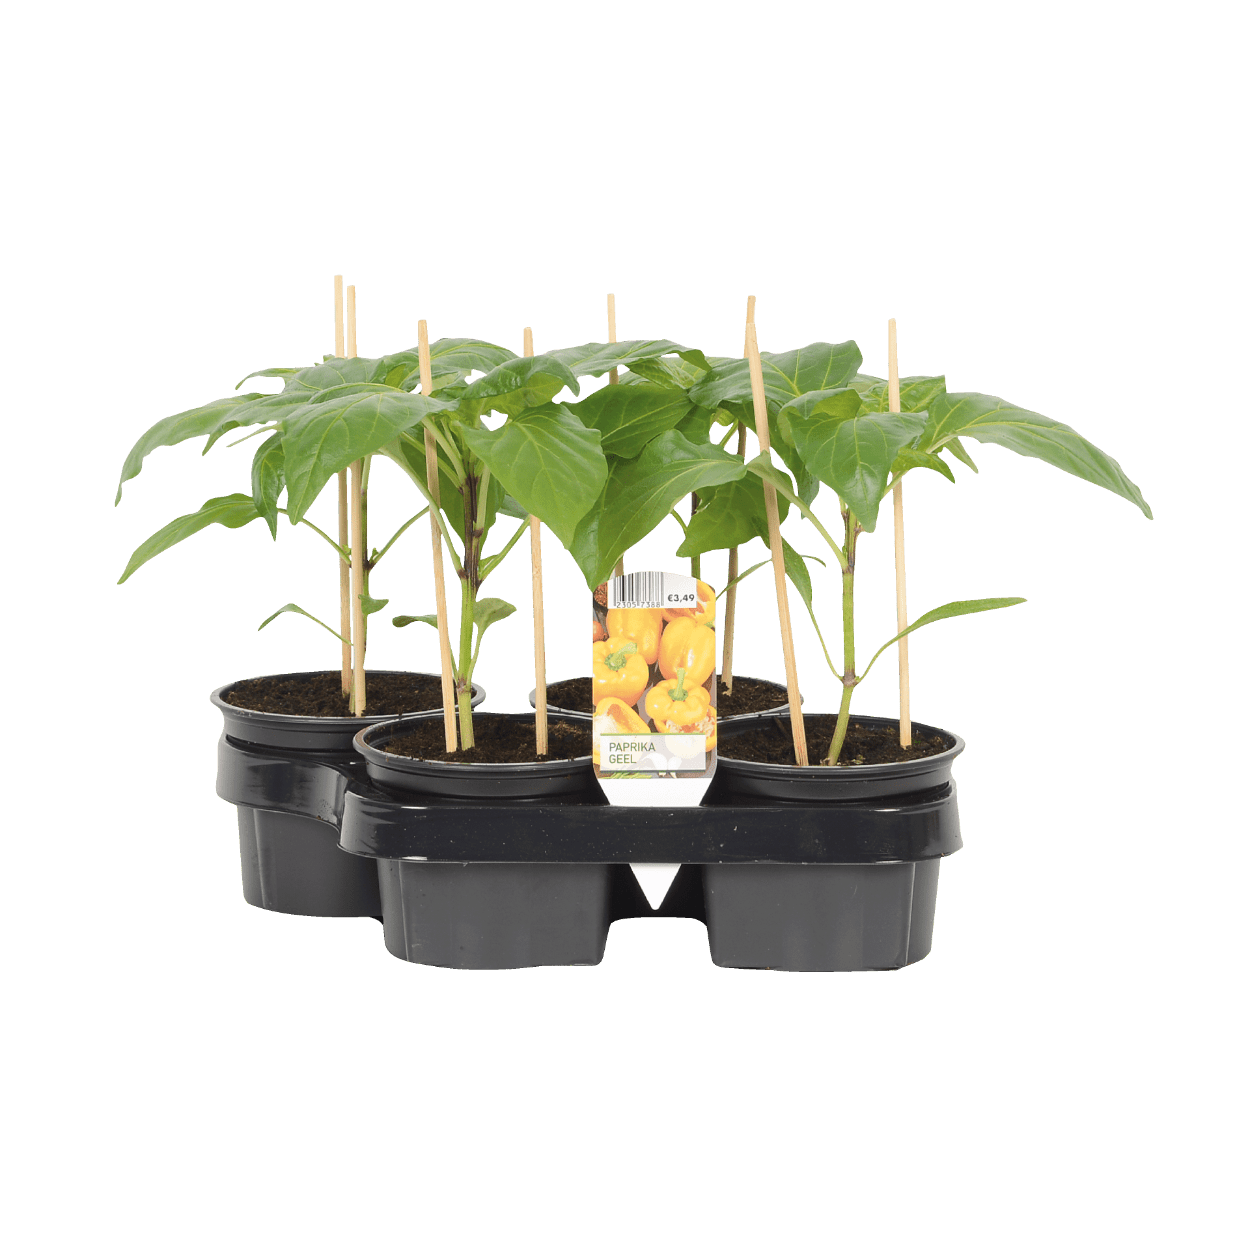 groente planten uit de aldi folder